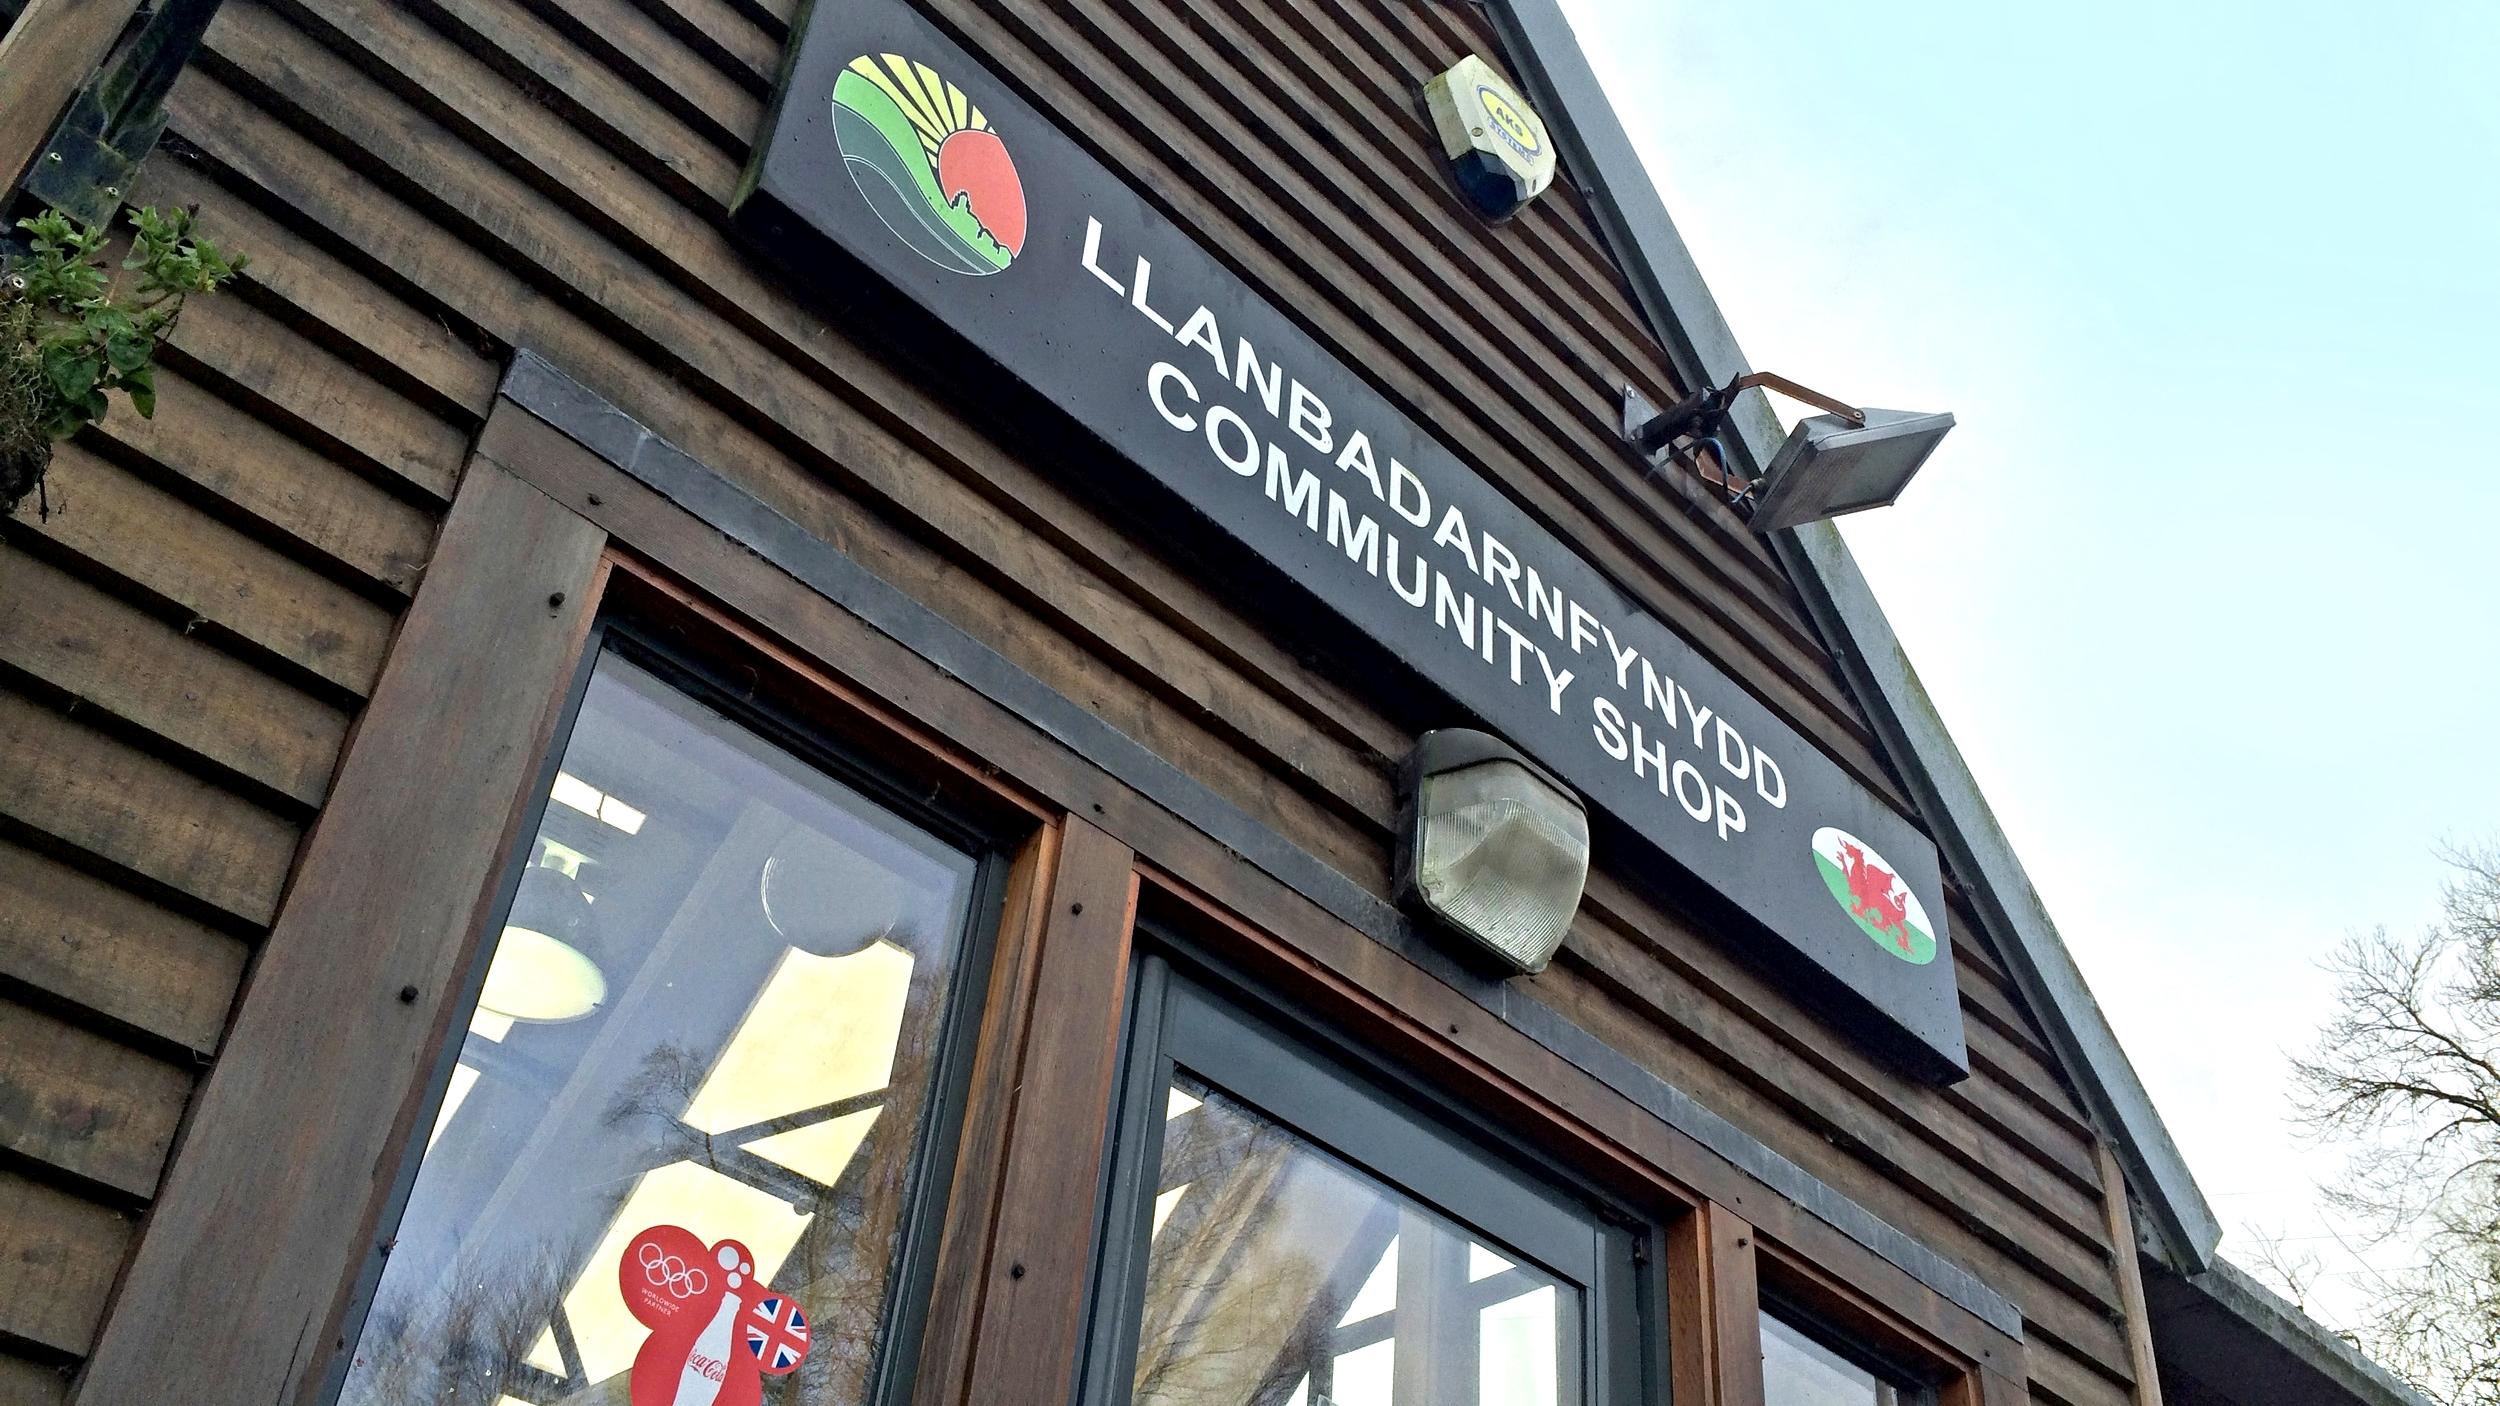 The Community Shop